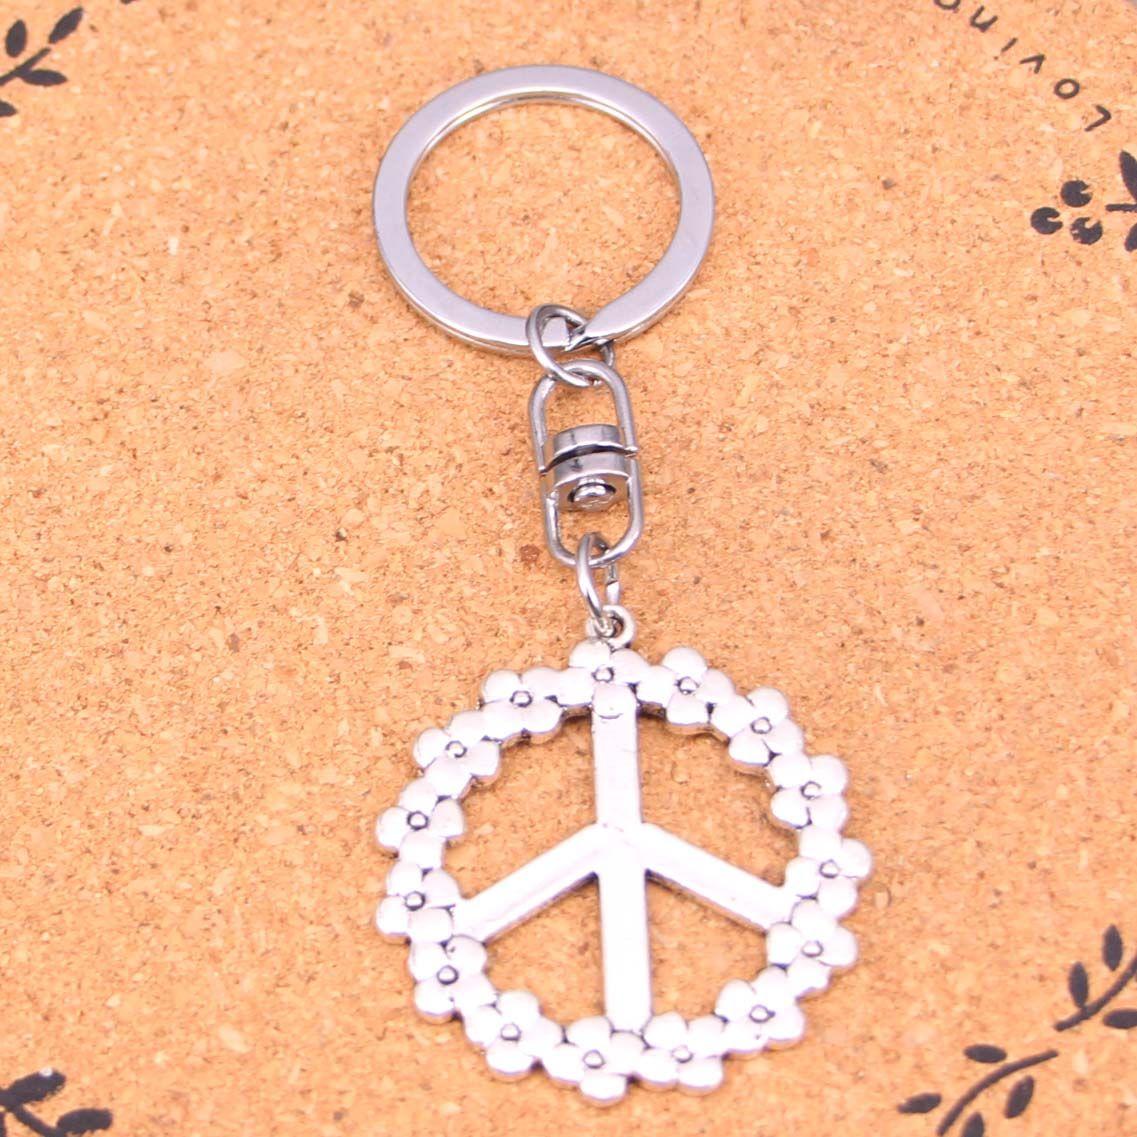 New Arrival Novelty Souvenir Metal peace symbol Key Chains Creative Gifts Apple Keychain Key Ring Trinket Car Key Ring